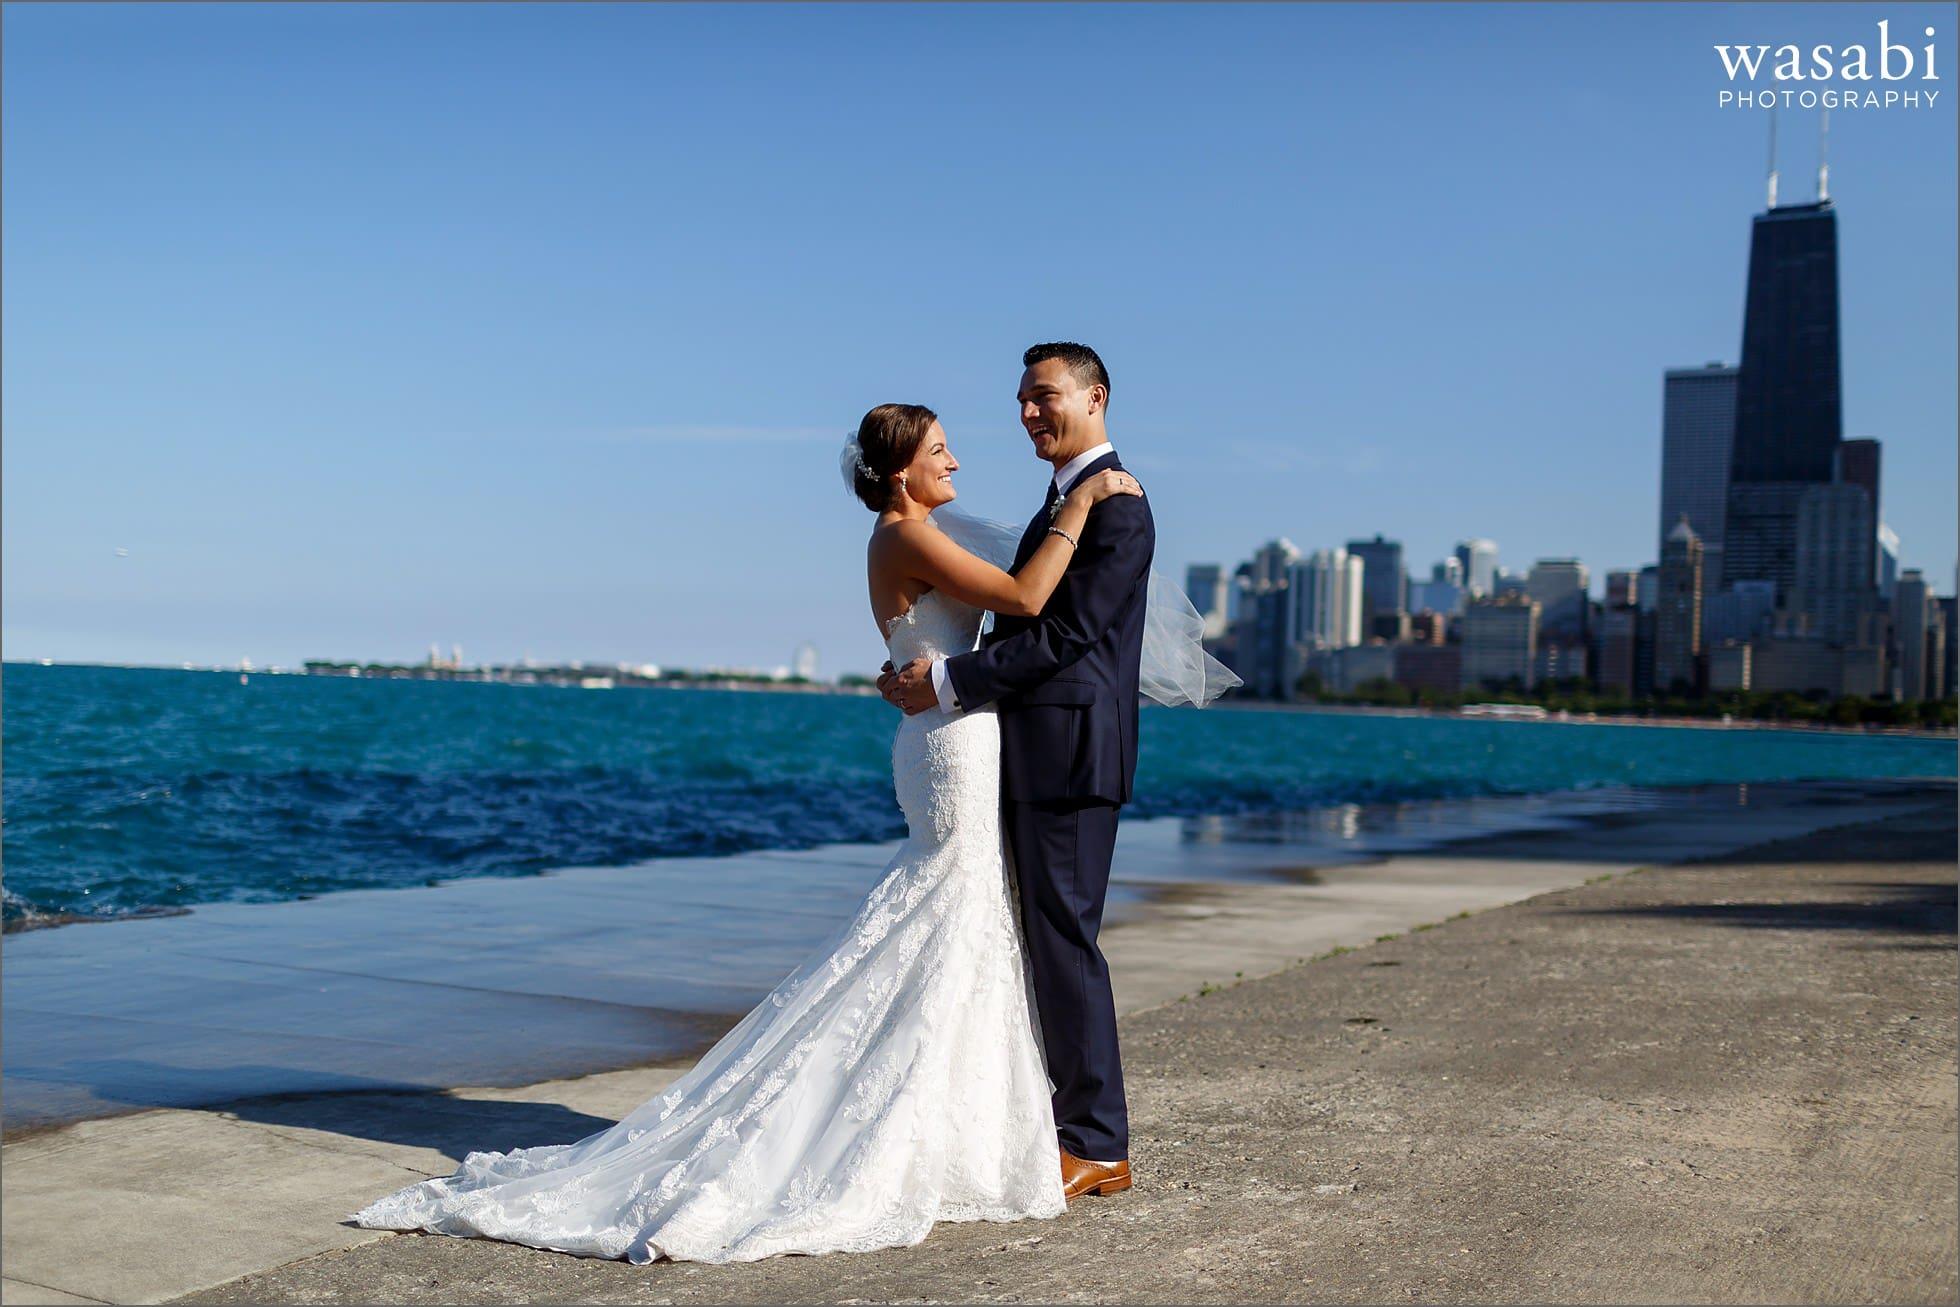 north ave beach wedding photos